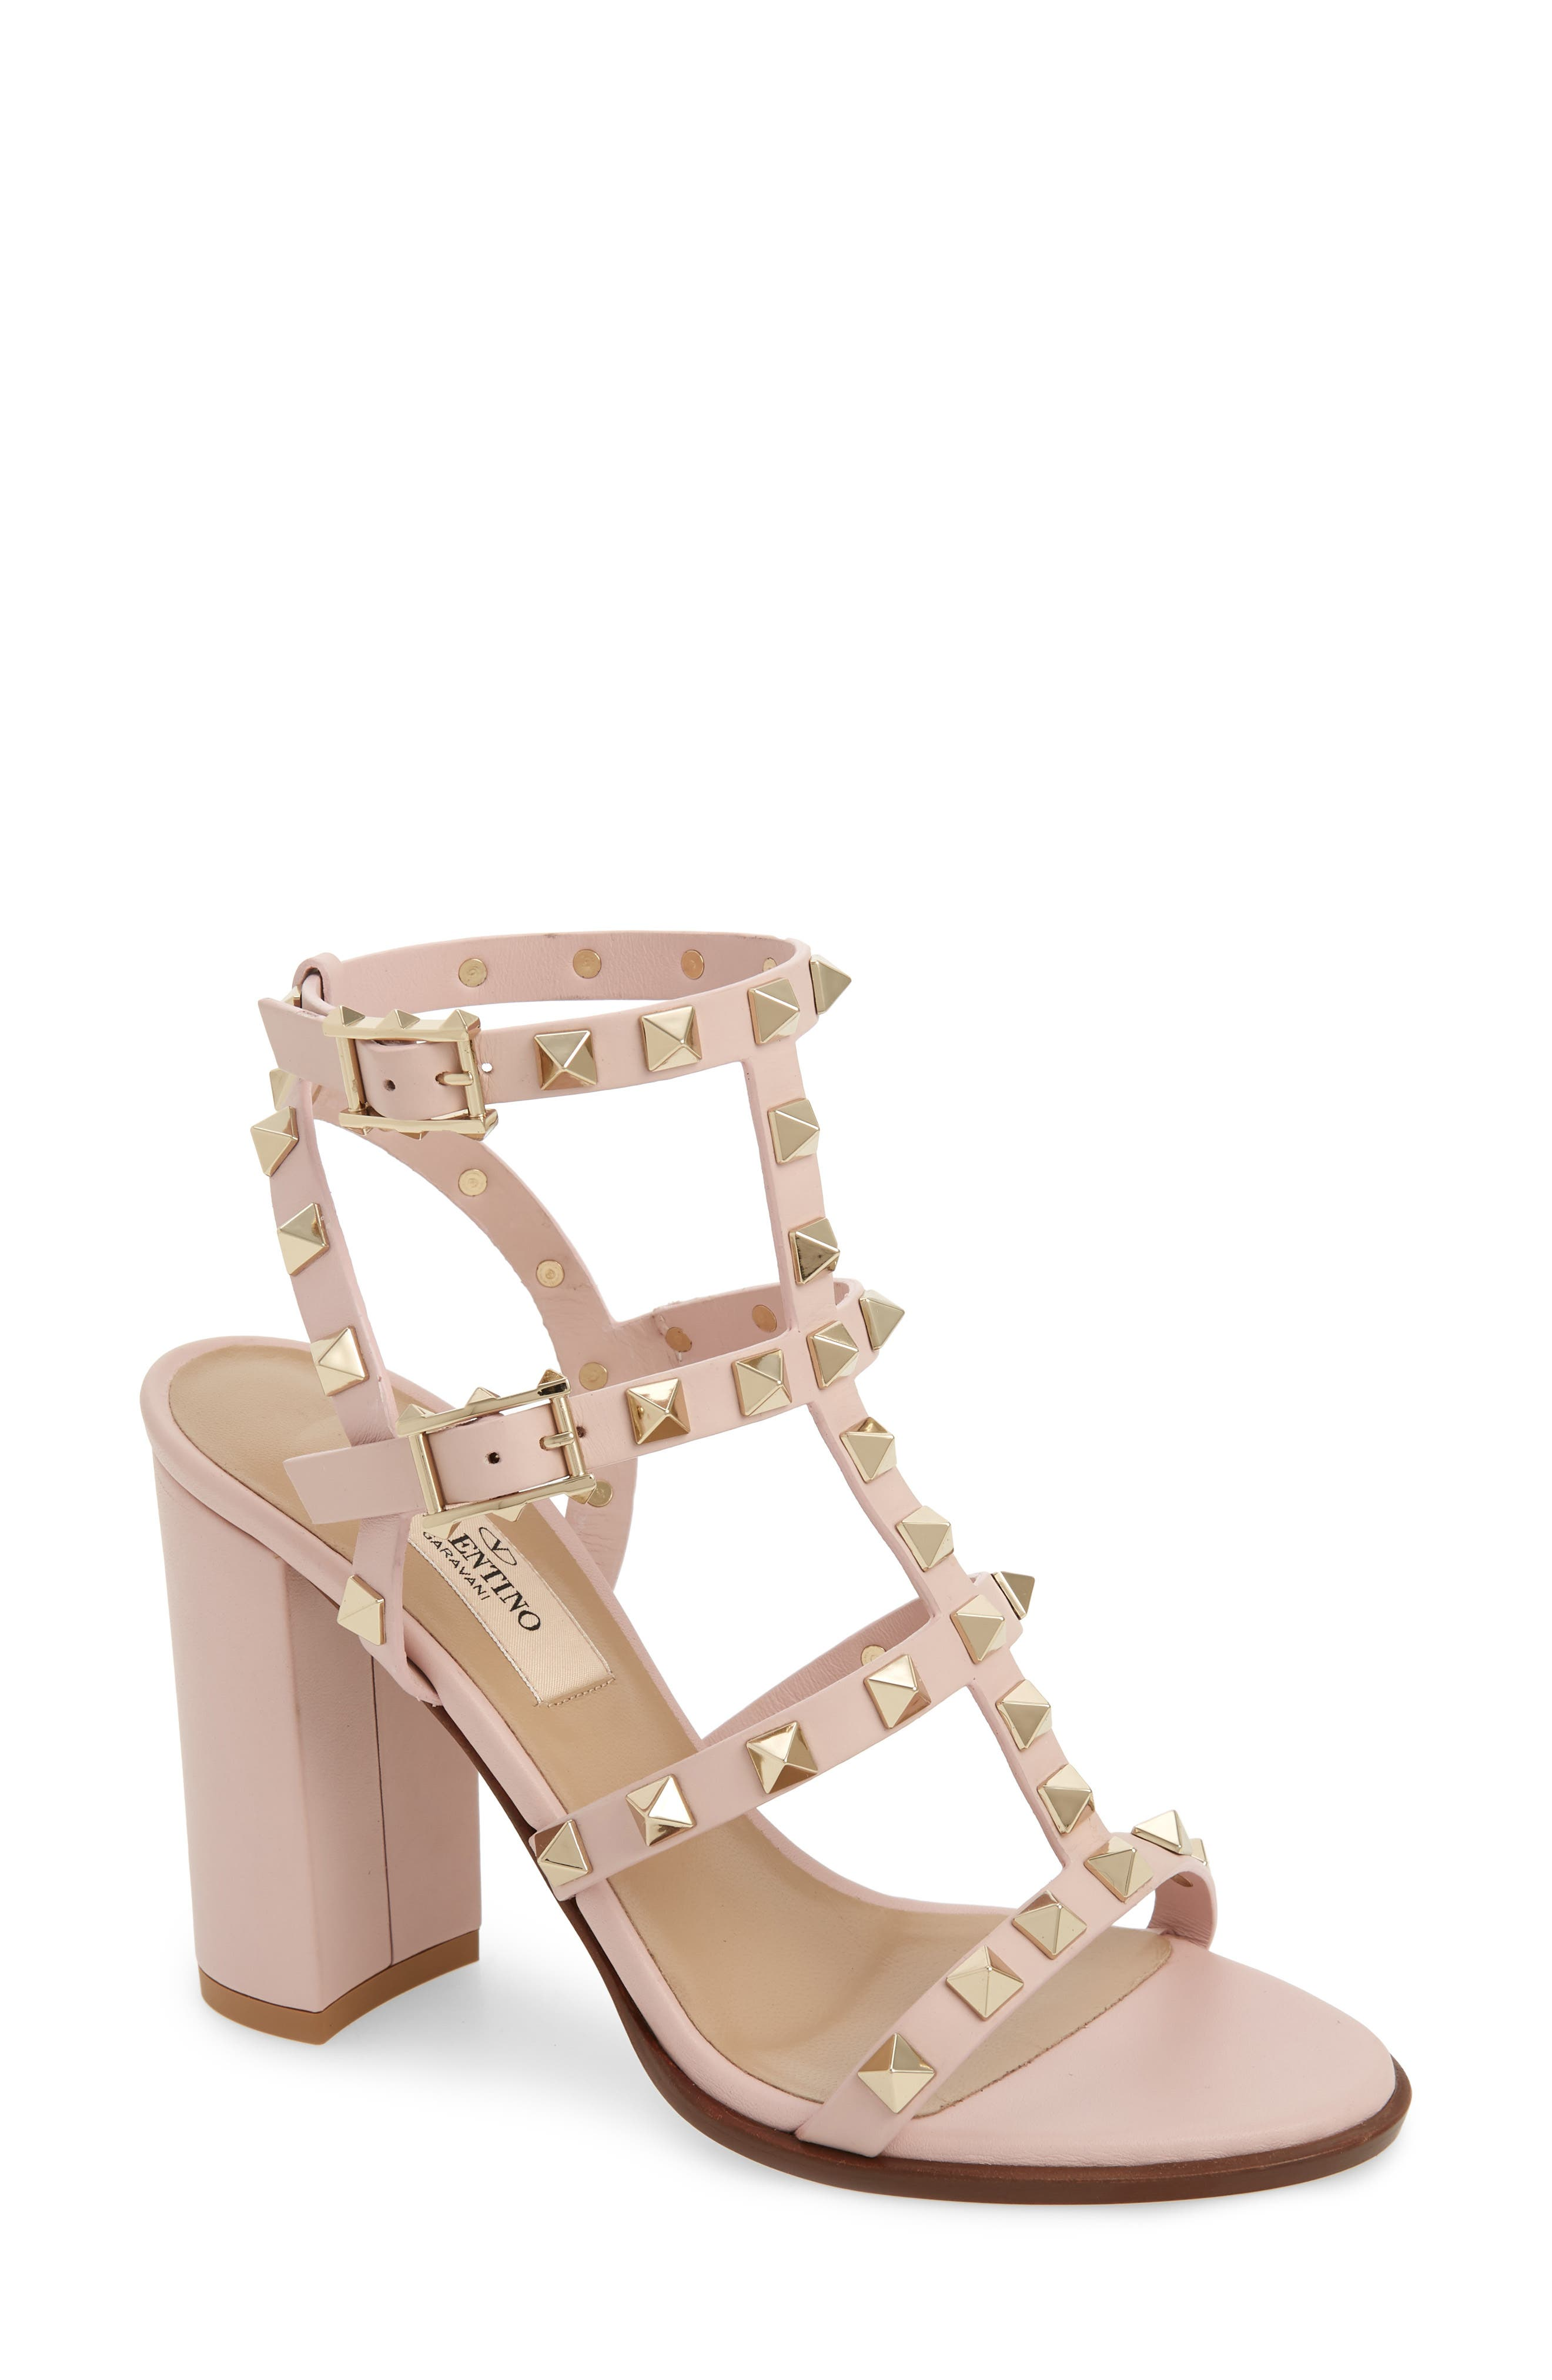 VALENTINO GARAVANI Rockstud Block Heel Sandal, Main, color, WATER ROSE